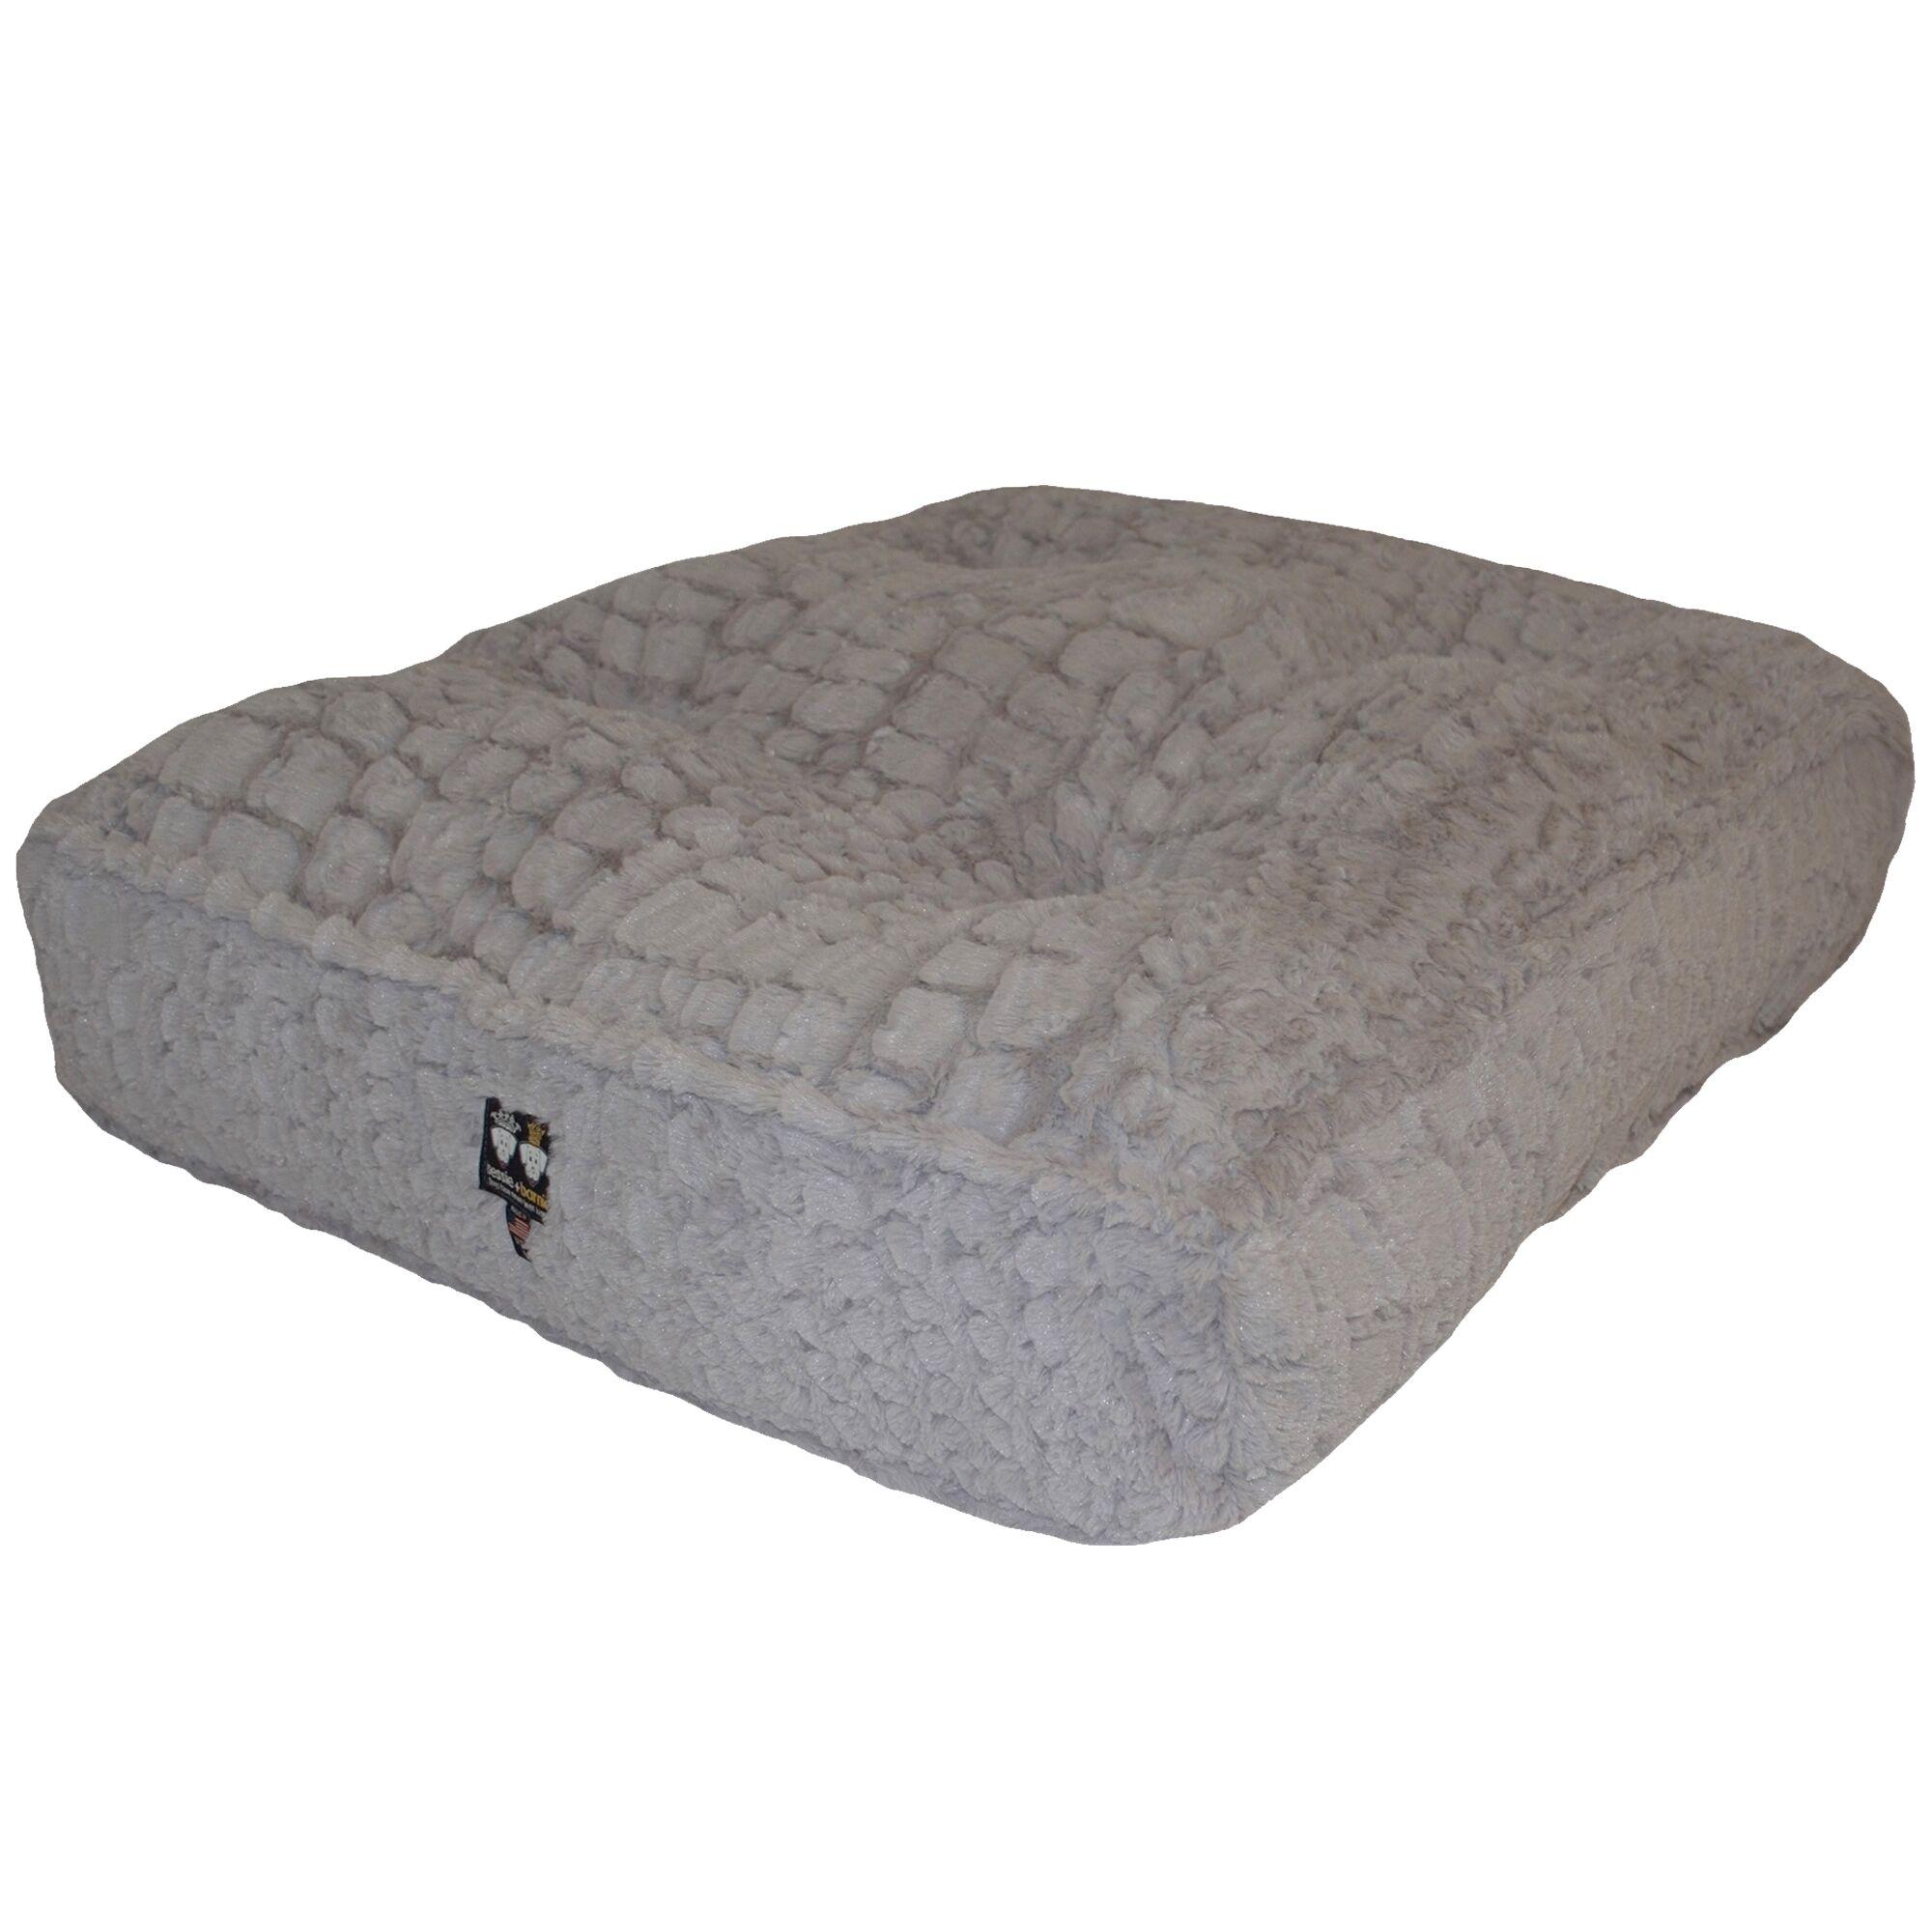 Aparicio Rectangle Serenity Dog Pillow Size: X-Large (56